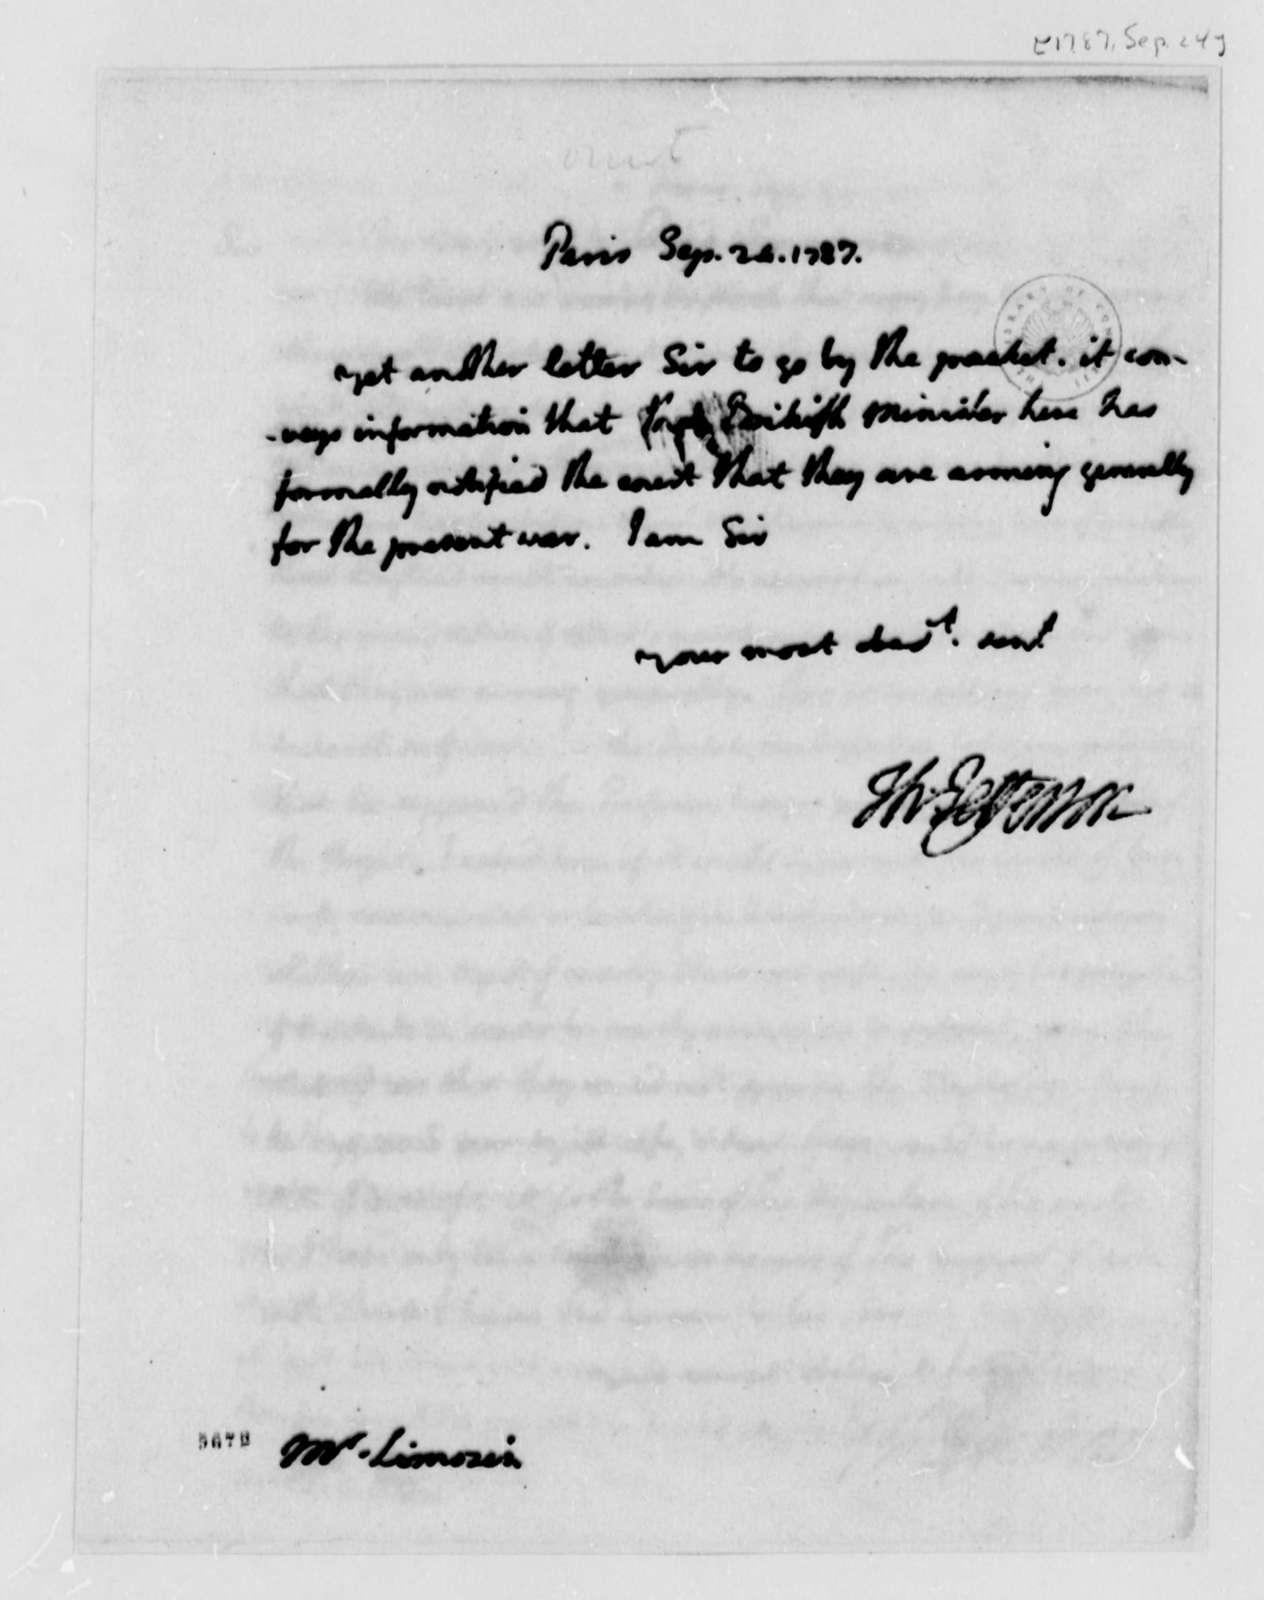 Thomas Jefferson to Andre Limozin, September 24, 1787